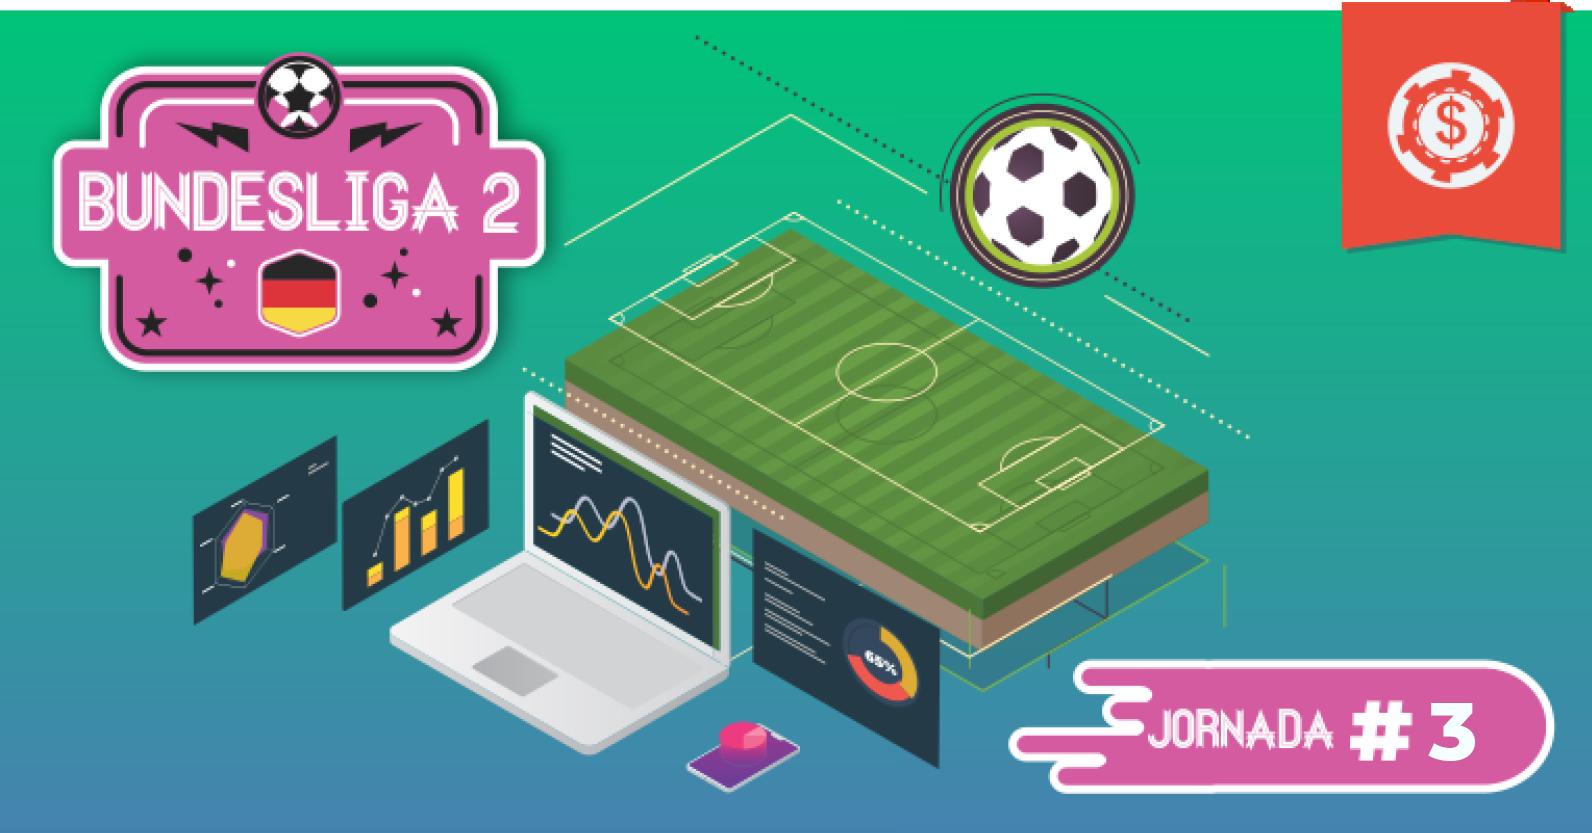 pronosticos-bundesliga-2-segunda-division-liga-alemana-apuestas-jornada-3